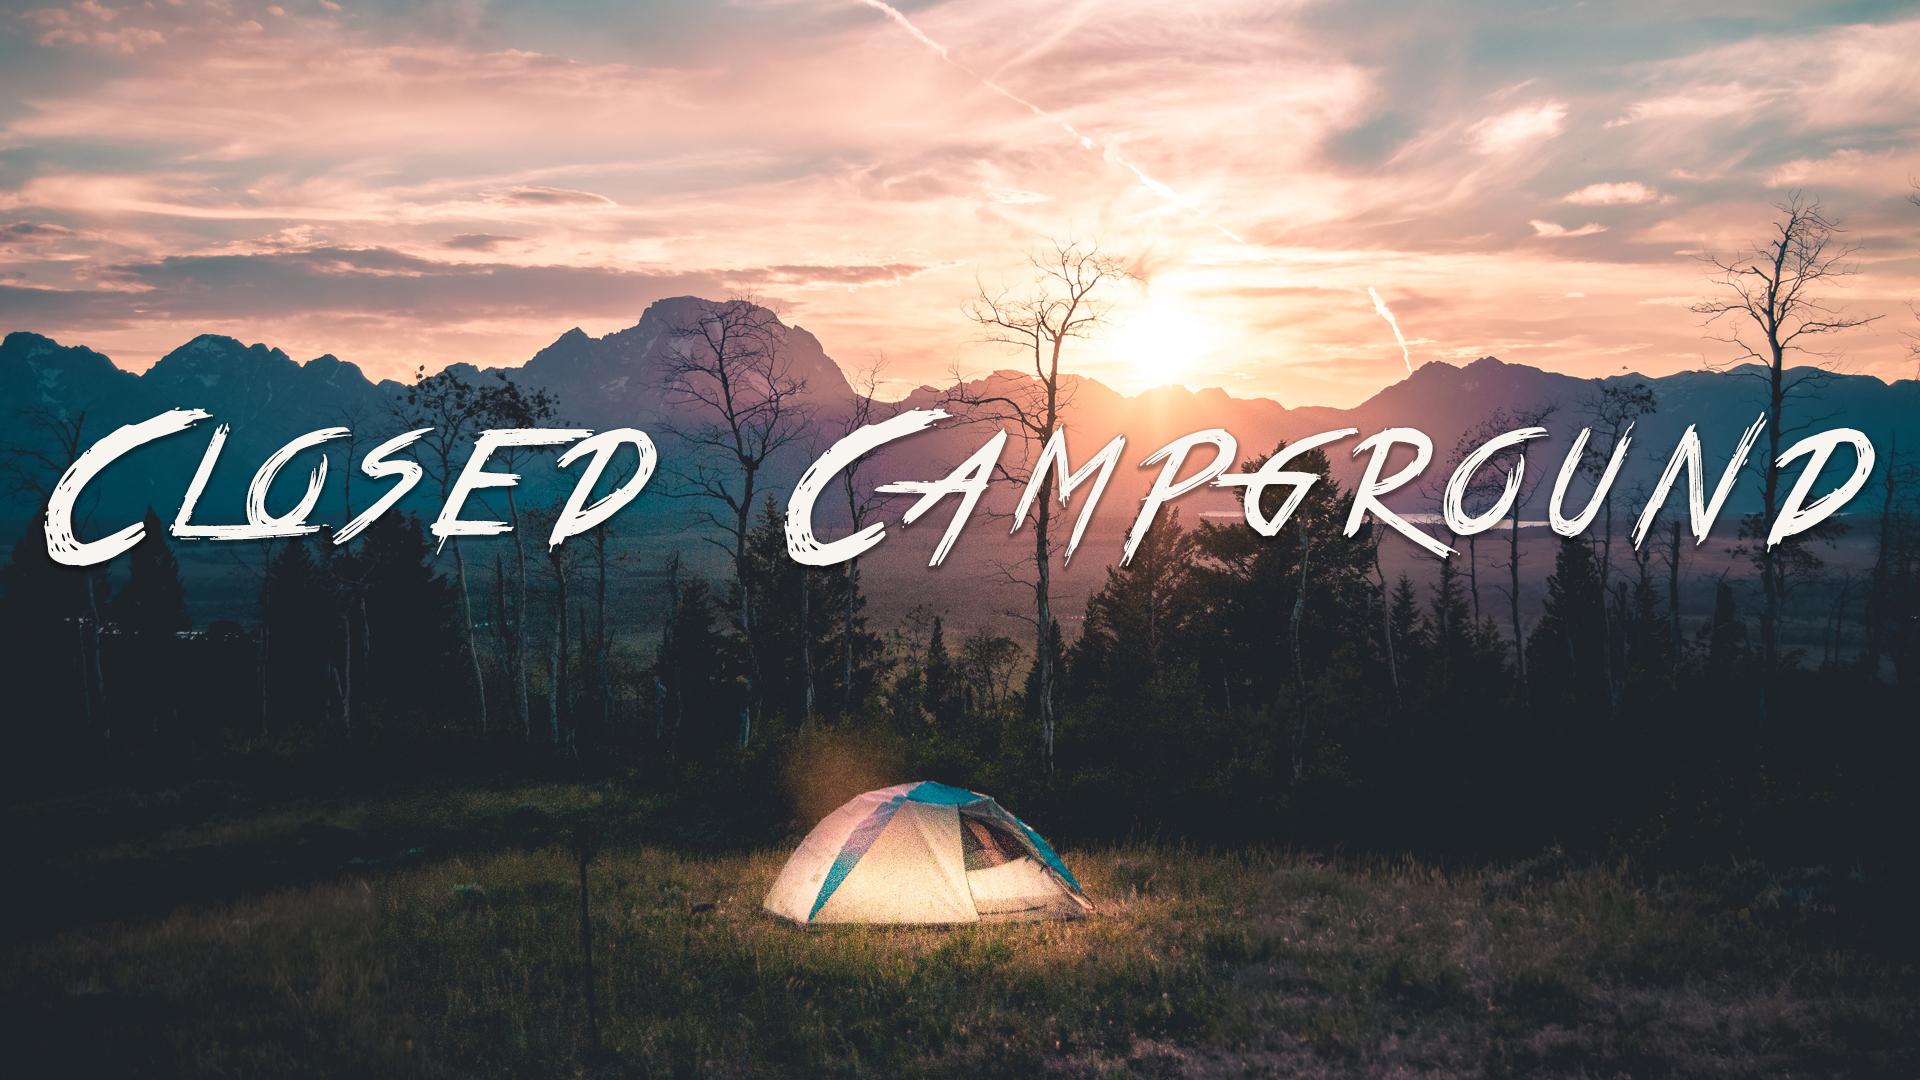 Closed Campground